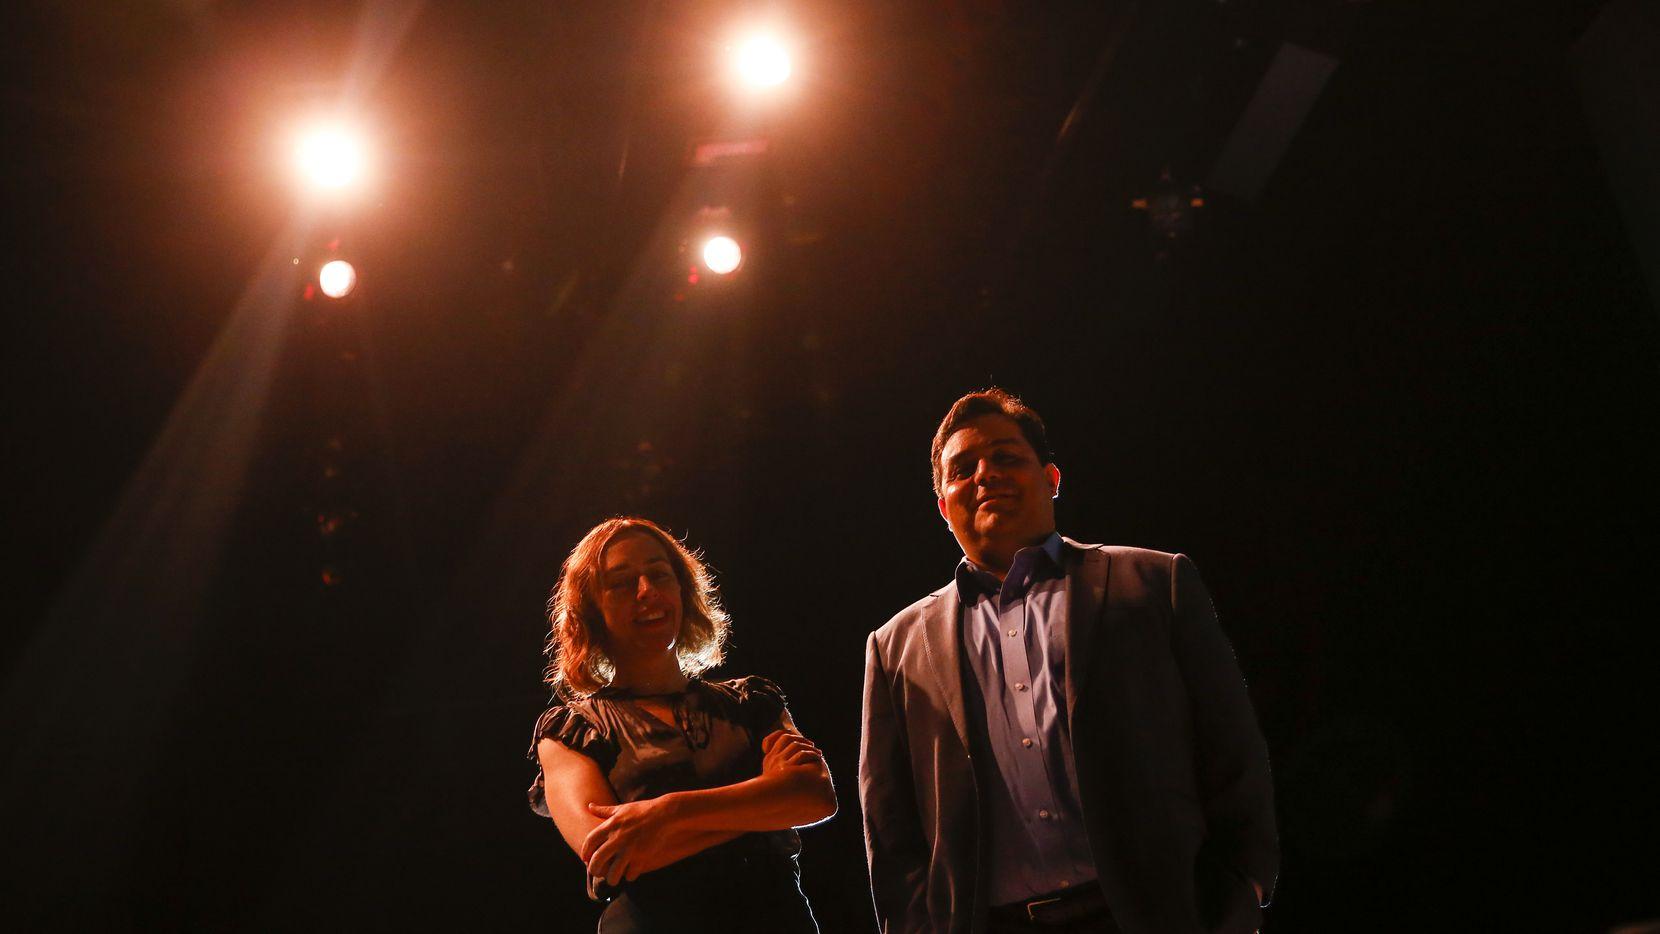 Sara Cardona, the executive director of Teatro Dallas, left, and David Lozano, the executive artistic director of Cara Mia Theatre, pose for a photograph on Wednesday, Dec. 11, 2019 at the Latino Cultural Center in Dallas.